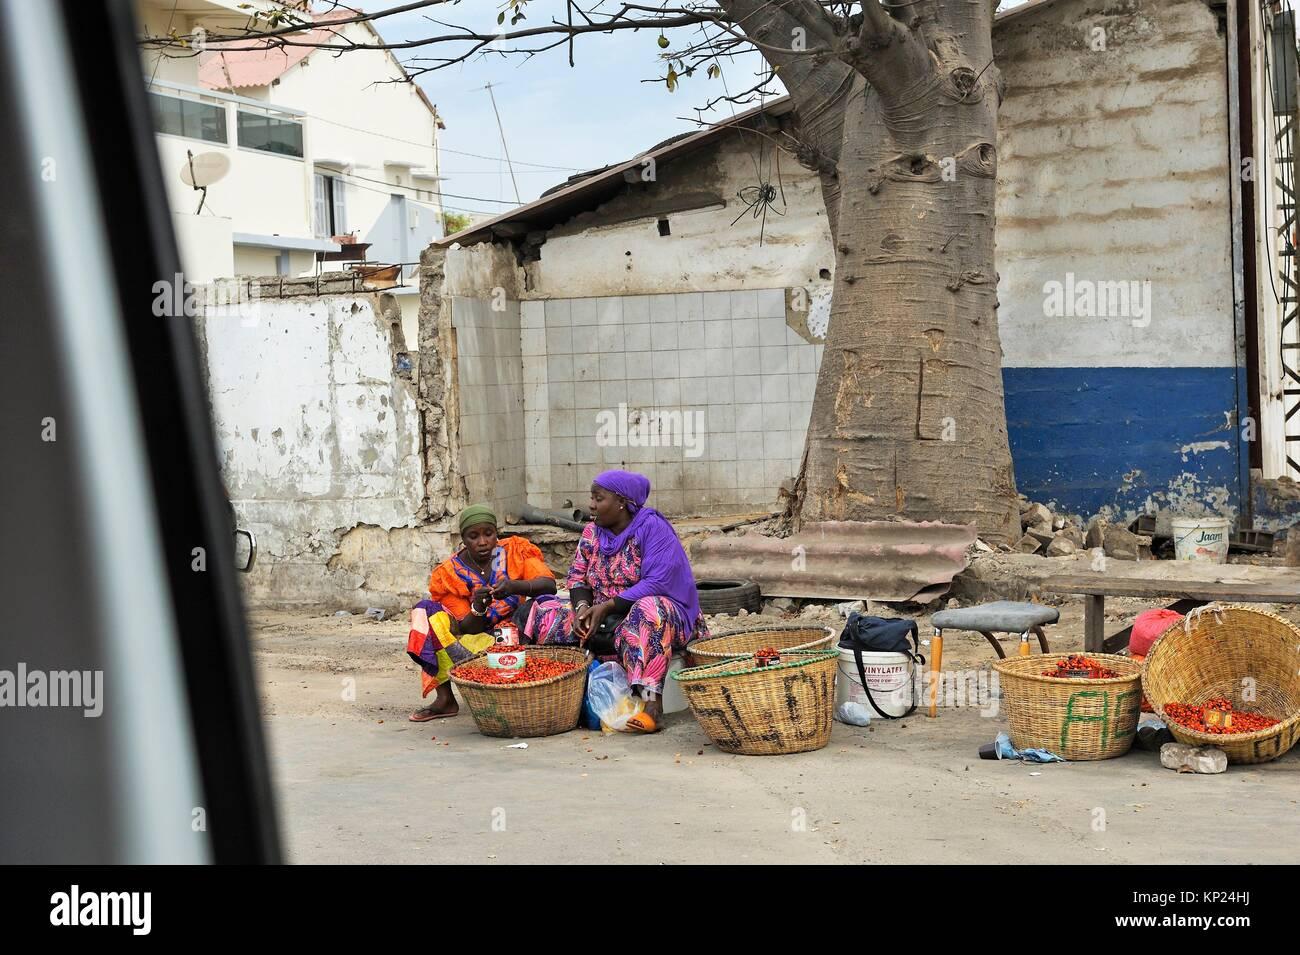 palm fruit street vendors under baobab tree, Dakar, Senegal, West Africa. - Stock Image